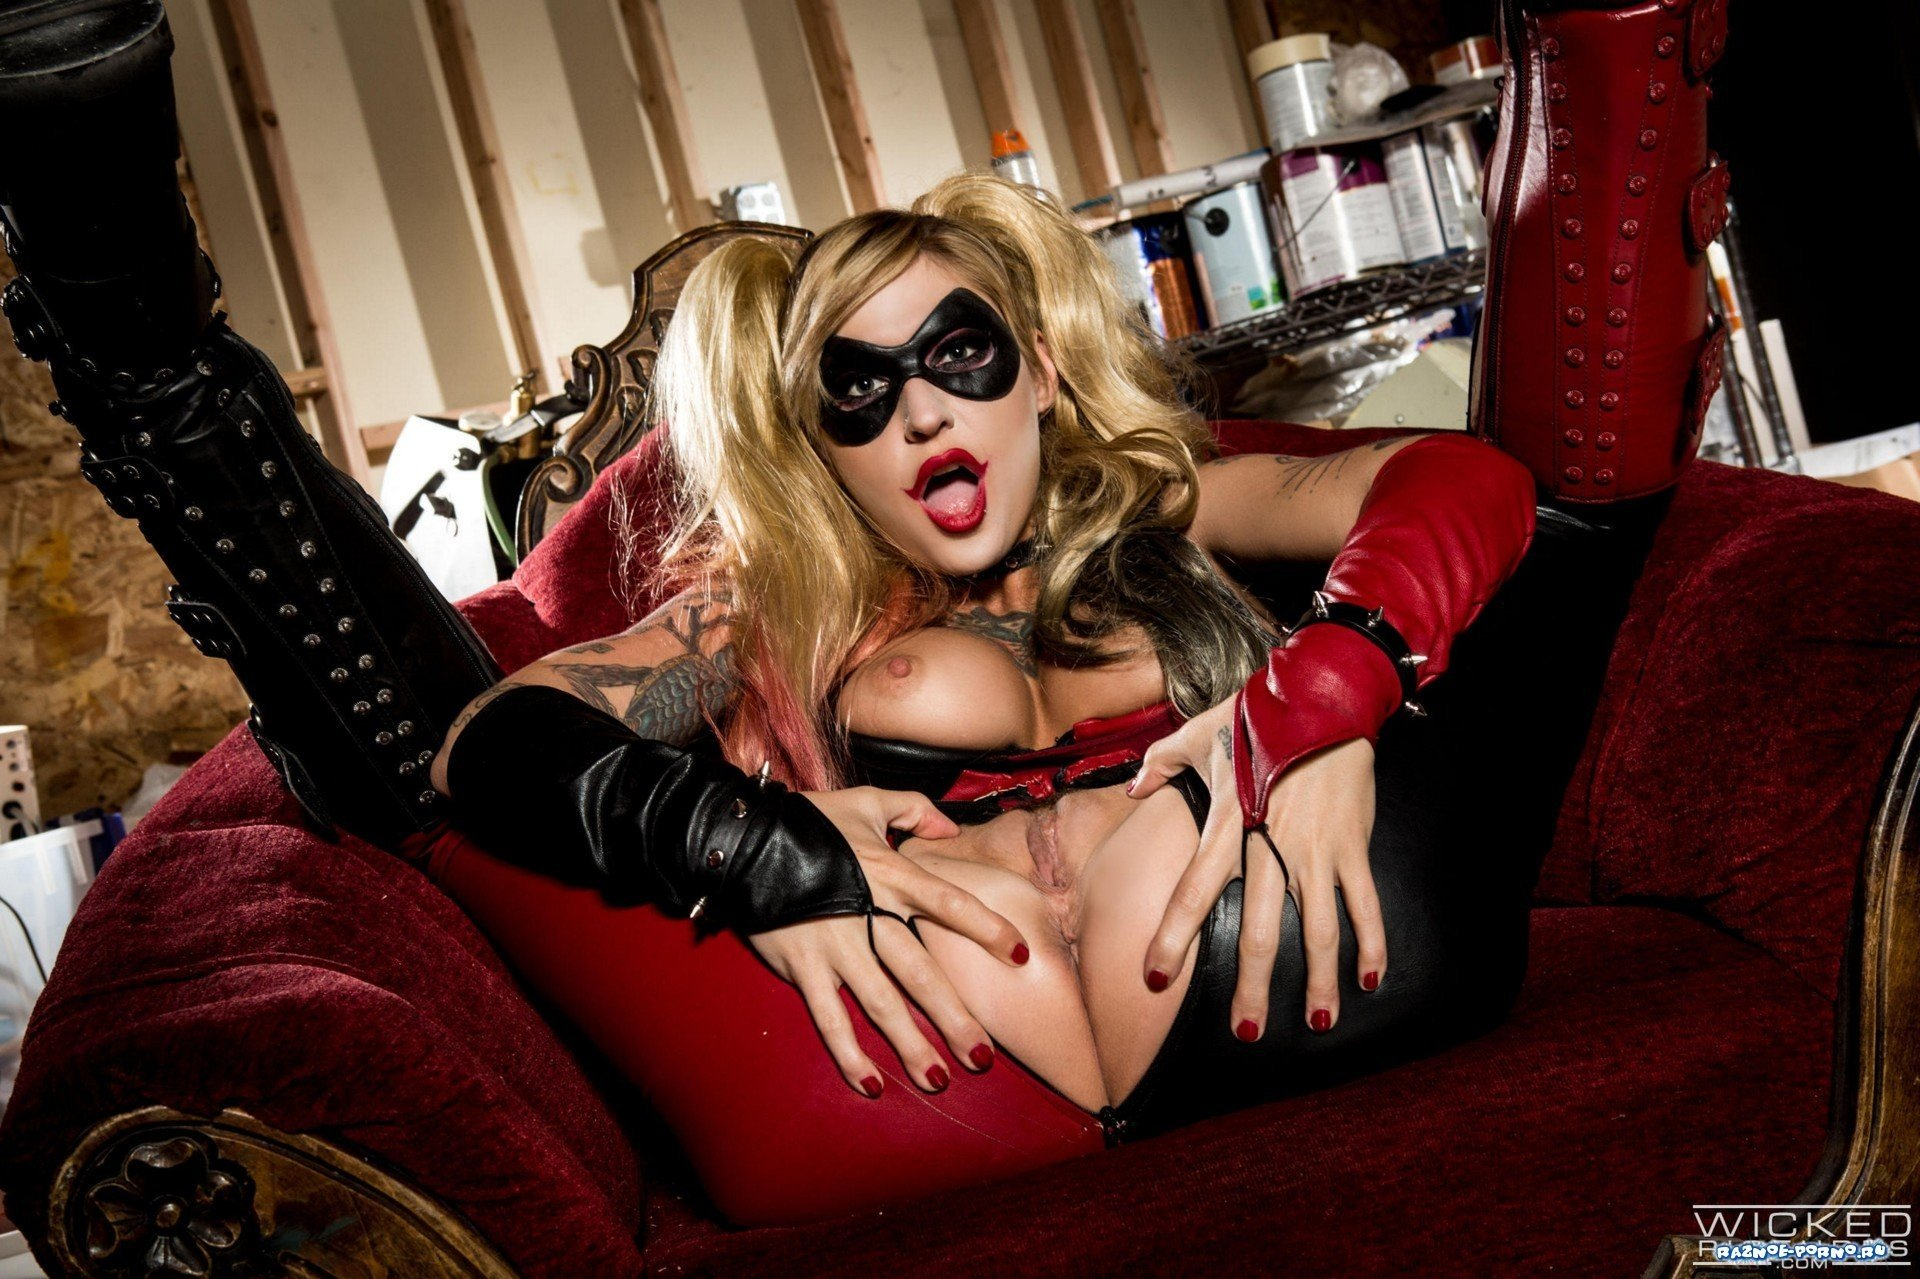 Aj Applegate Harley Jadehot Teen Lesbos Girls Love Sex In Front Of Camera Photo